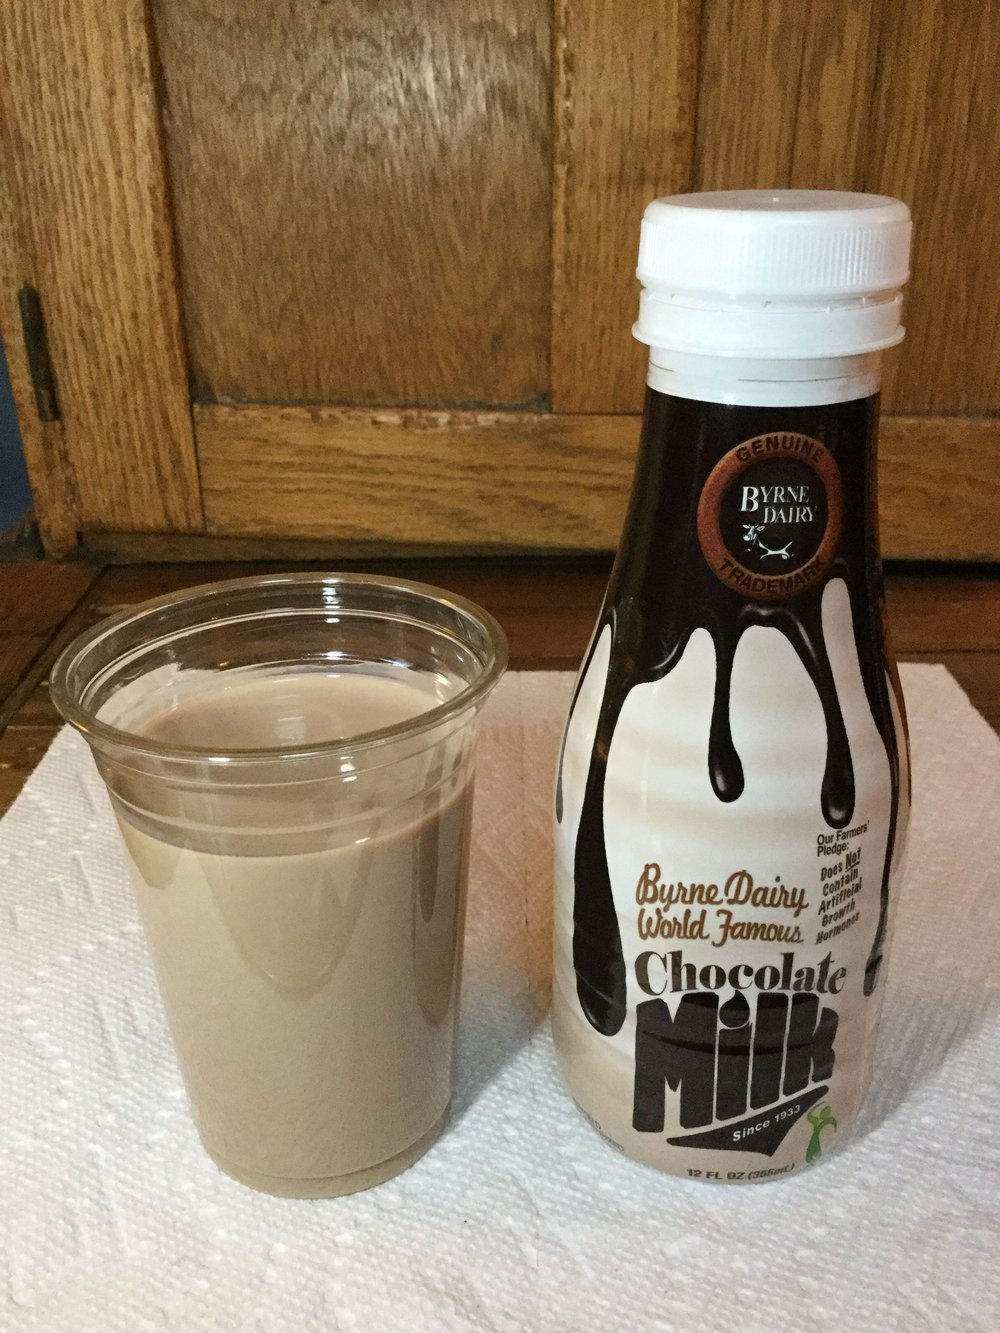 Byrne Dairy World Famous Chocolate Milk — afoolzerrand.com